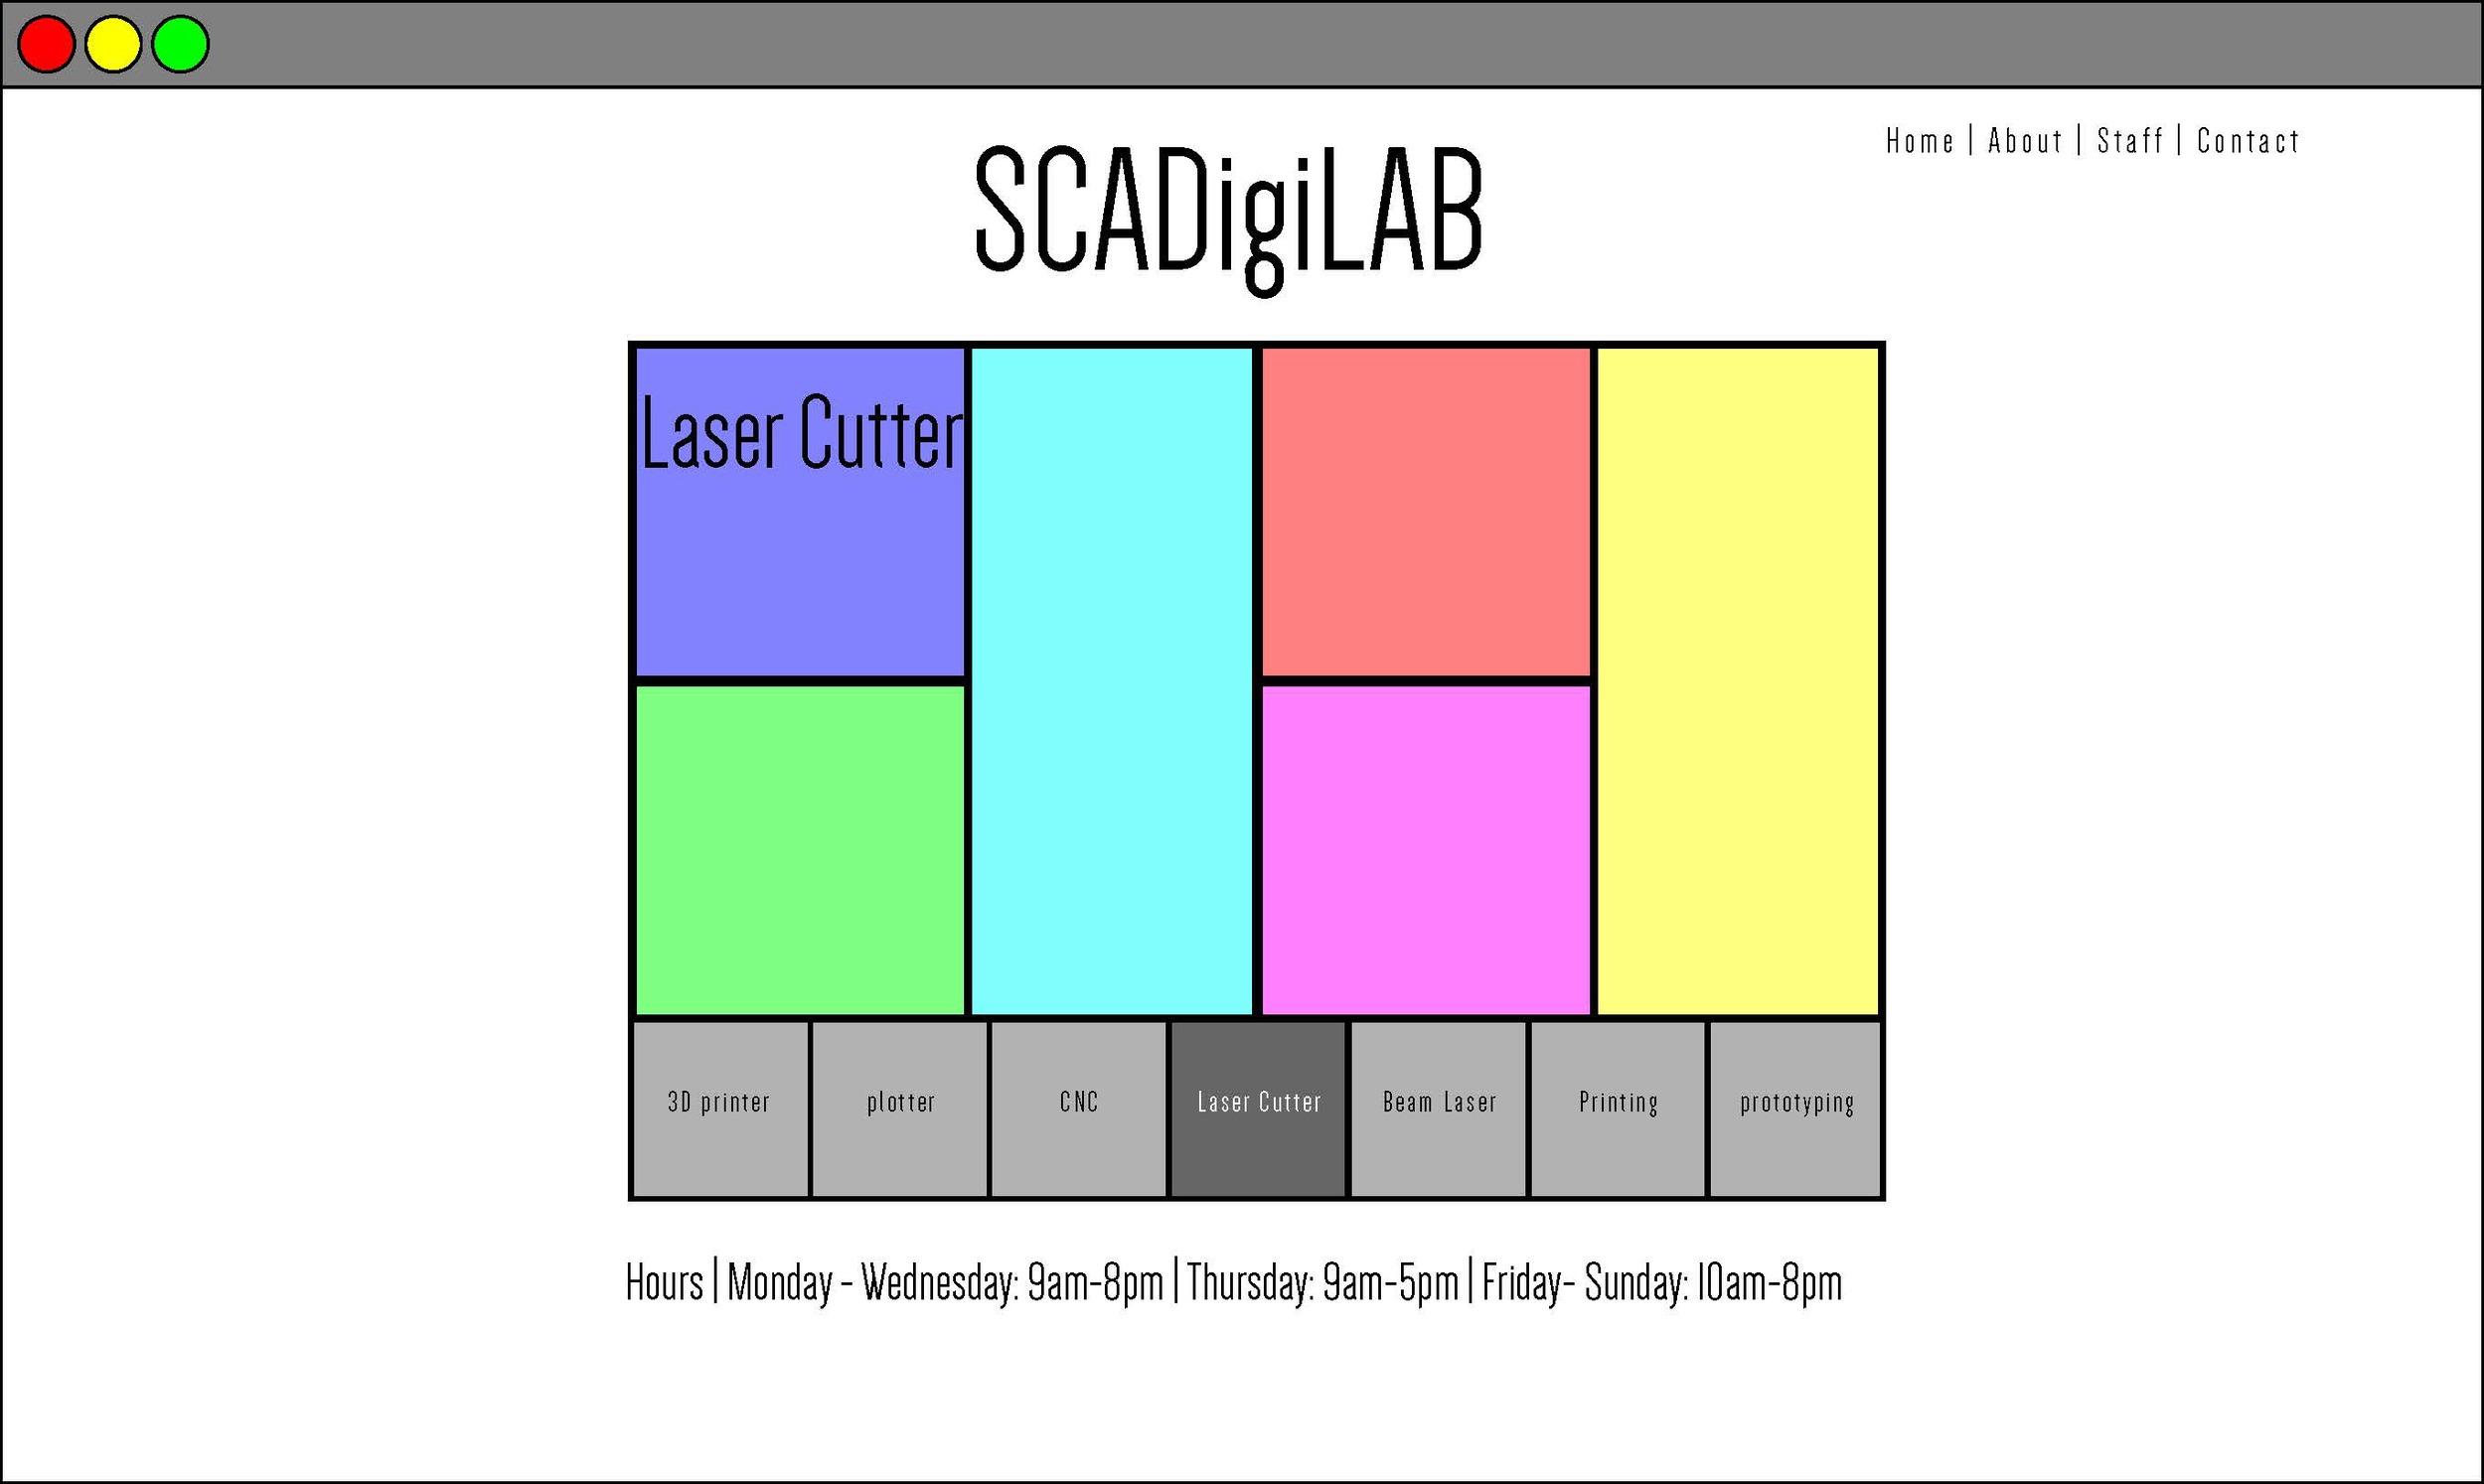 SCADigiLabWireFrame_Page_2.jpeg